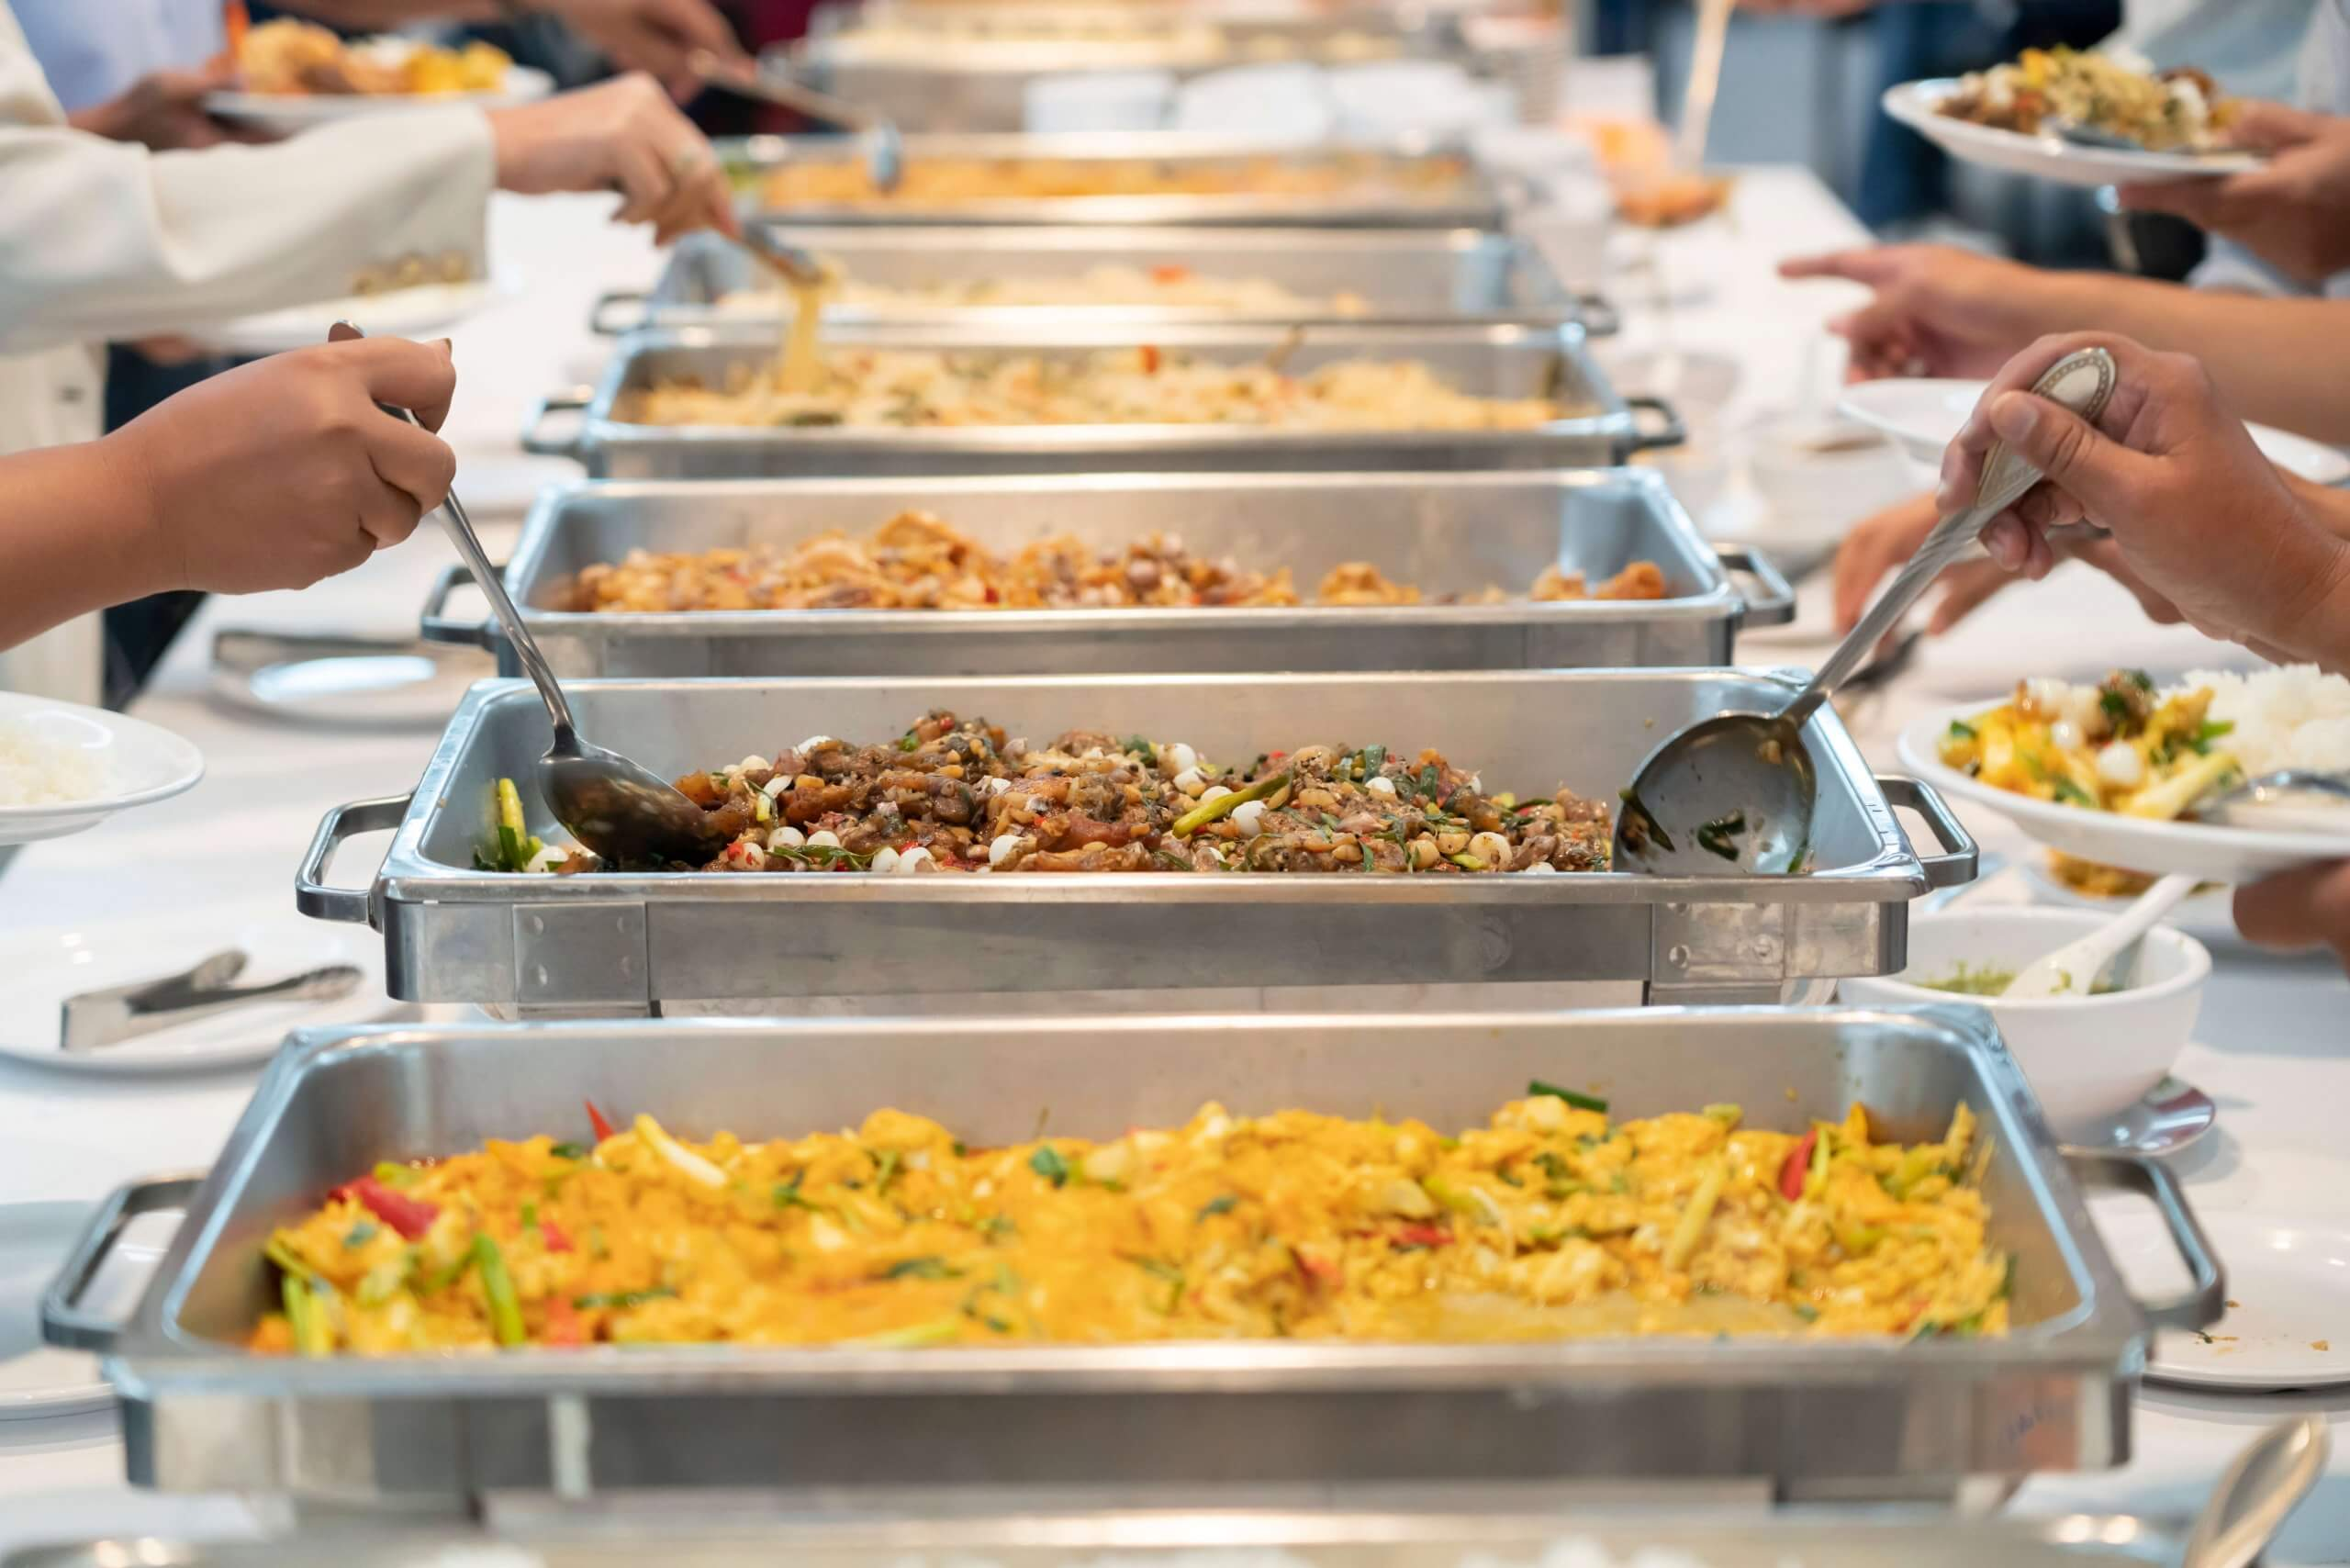 Catering Services in Meerbusch und Umgebung